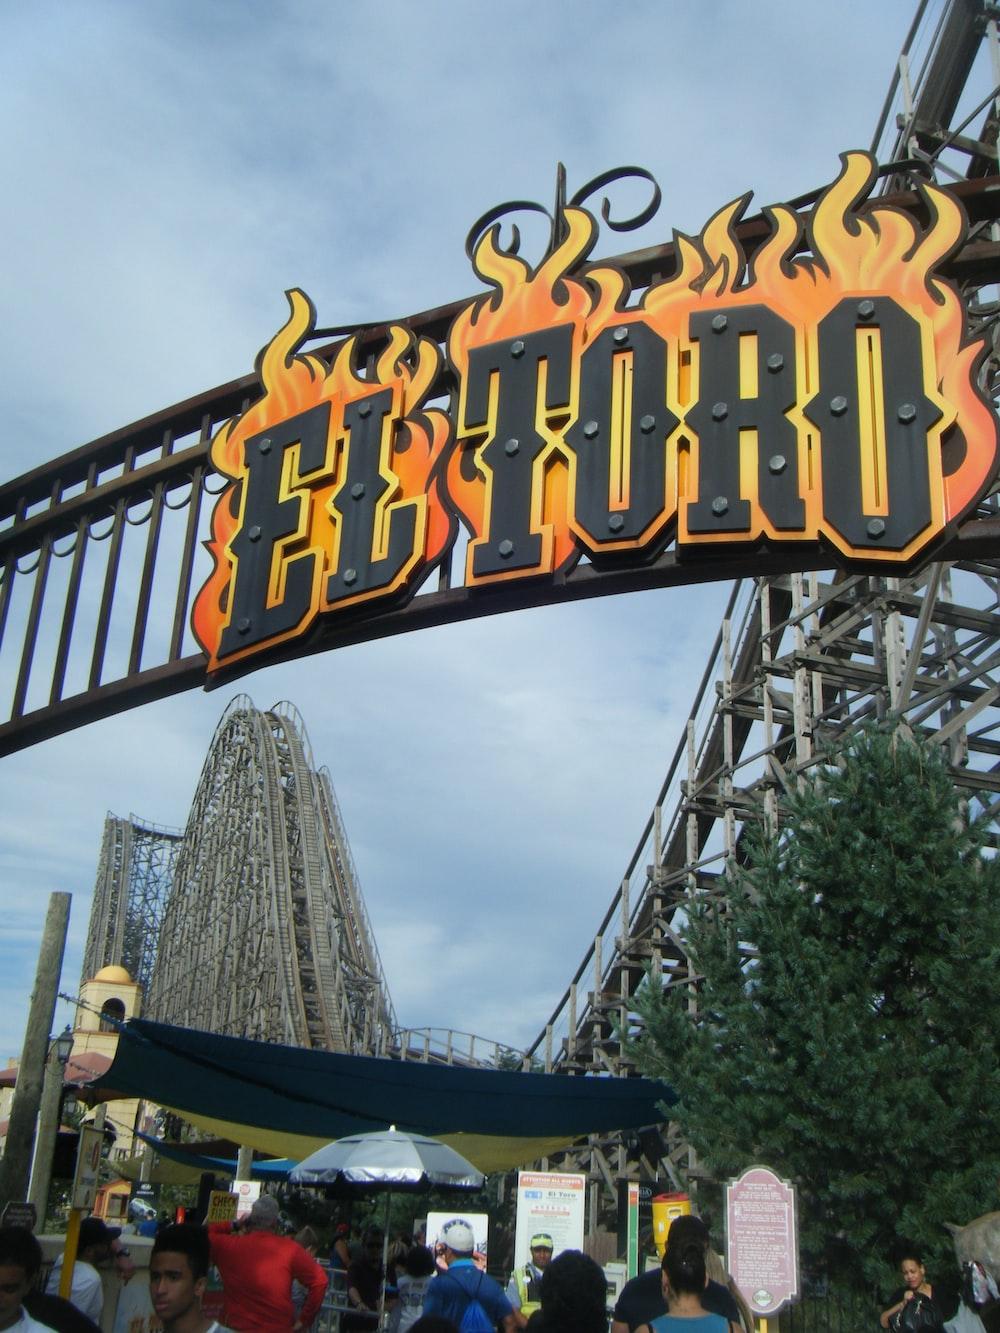 black and yellow flame El Toro signage